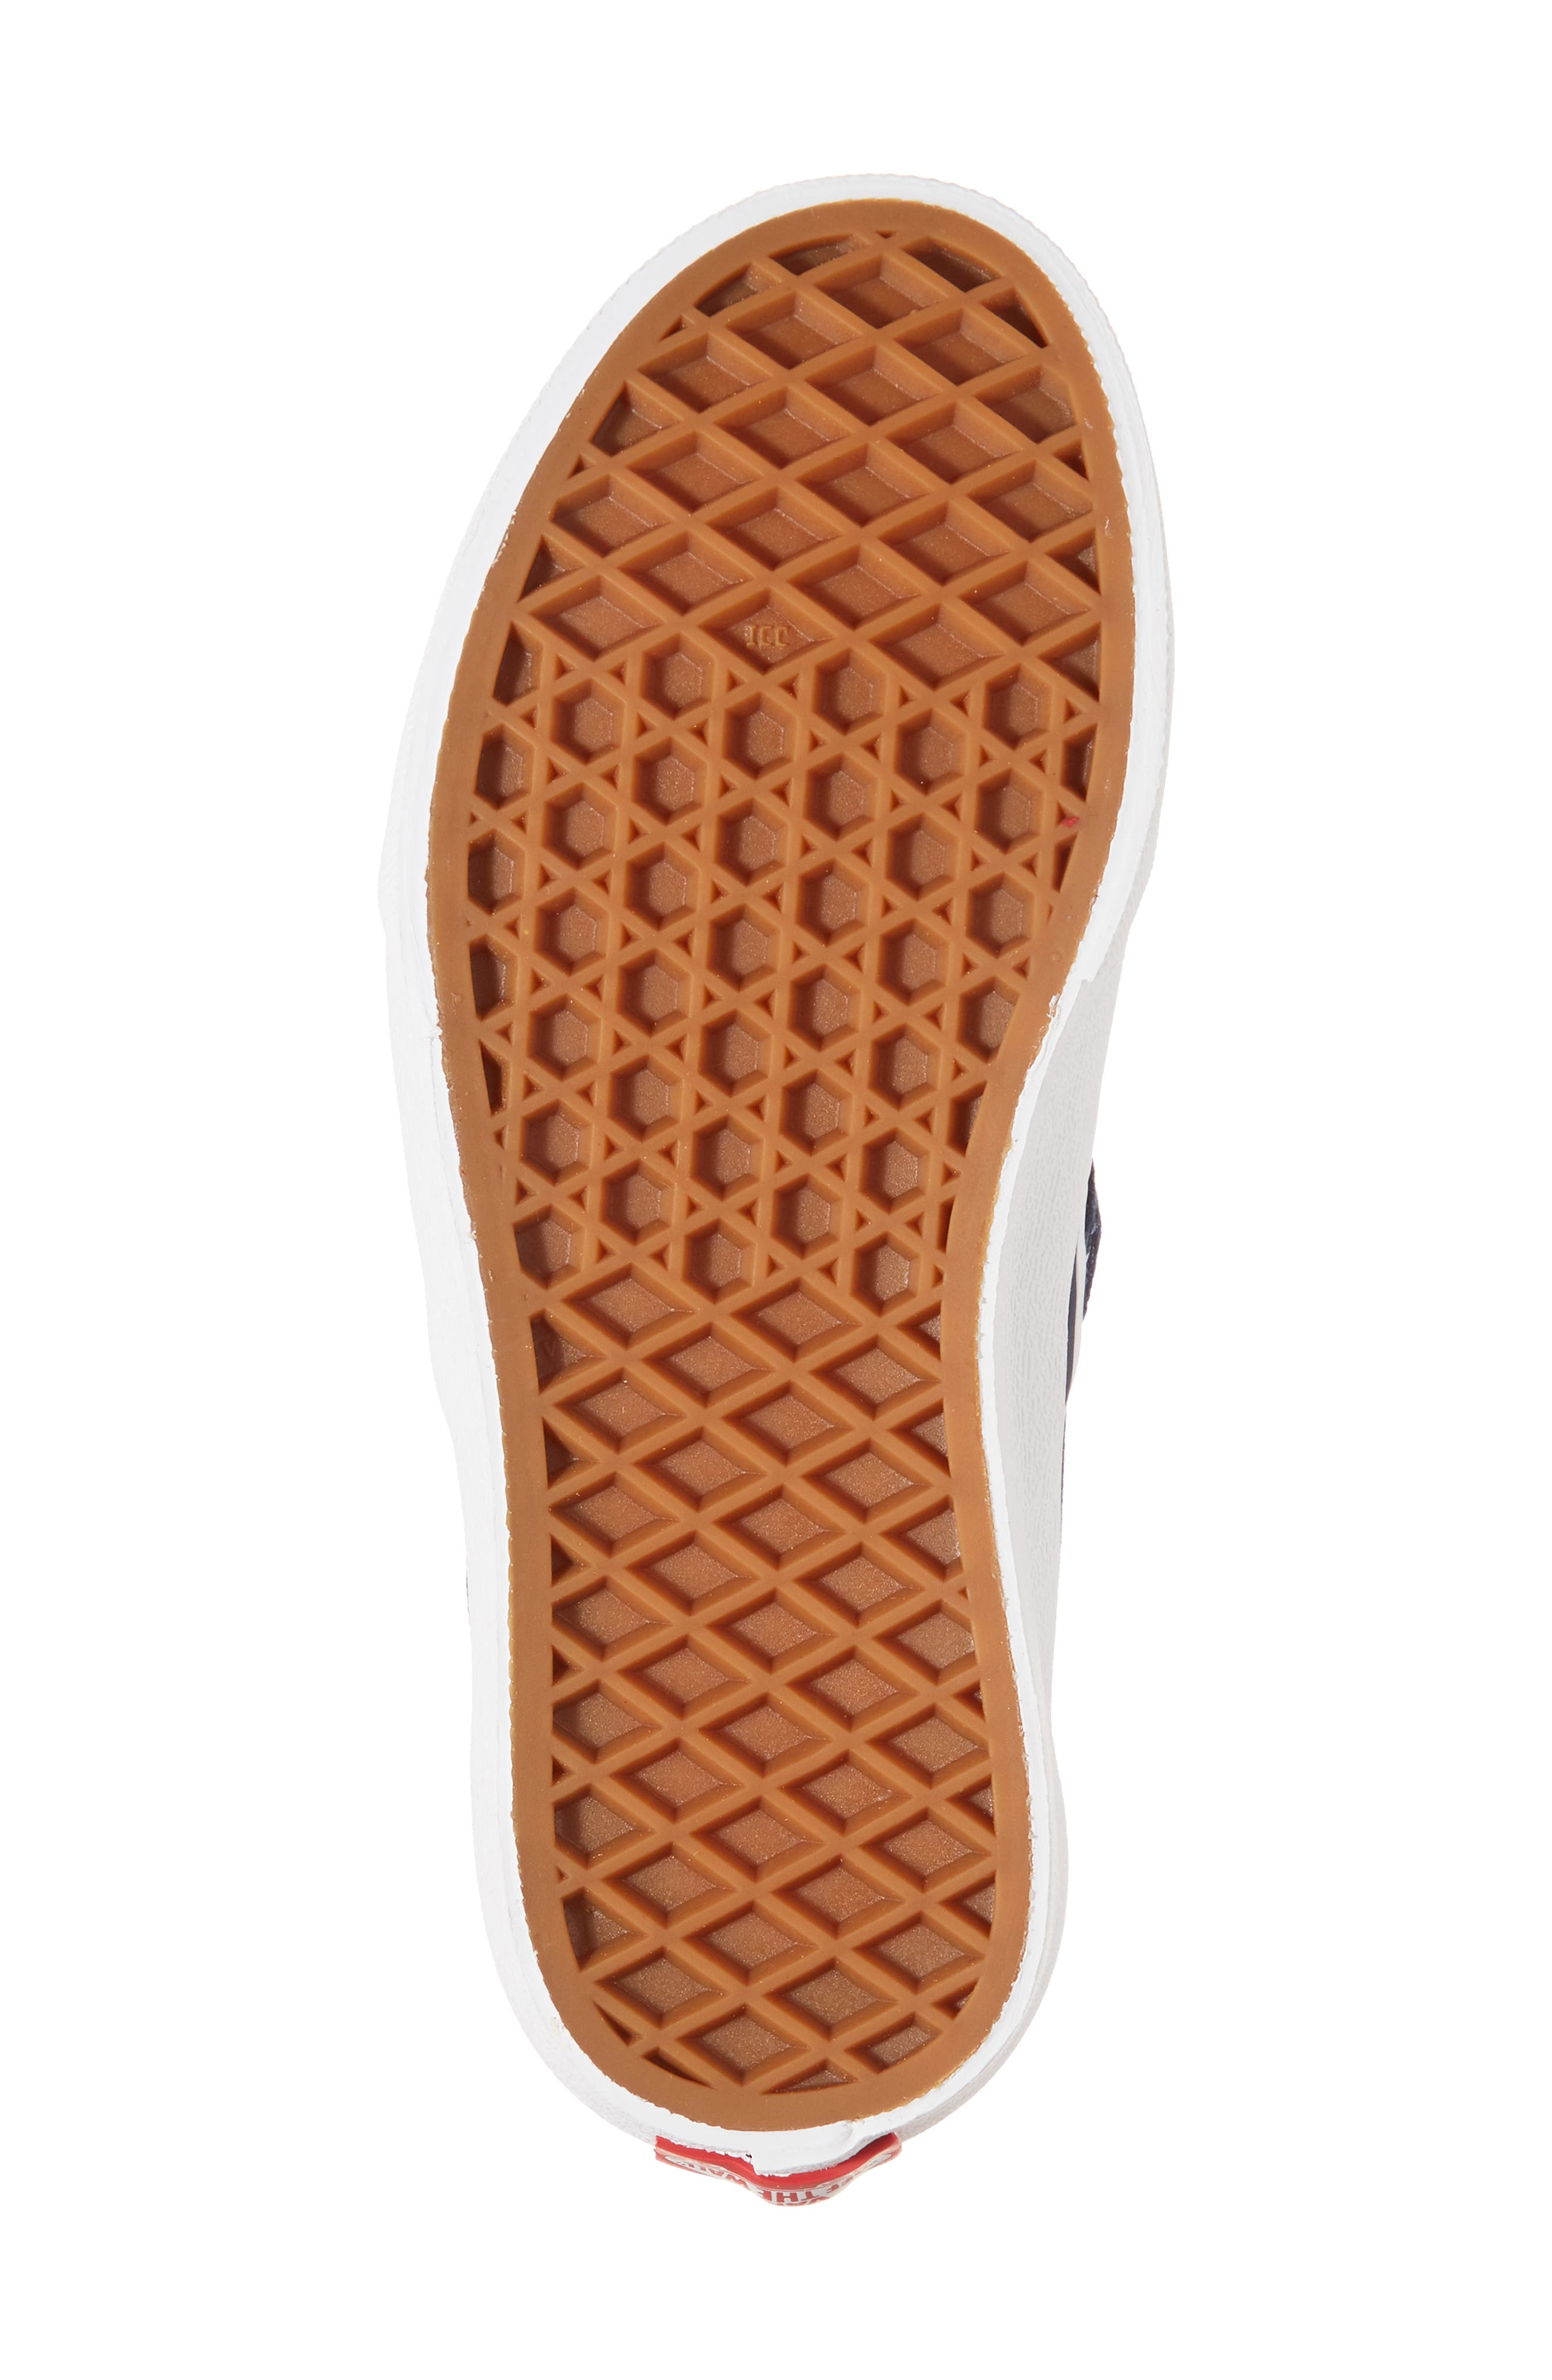 Denim C&L Slip-On 59 Sneaker,                             Alternate thumbnail 6, color,                             Denim Dress Blues/ Chipmunk